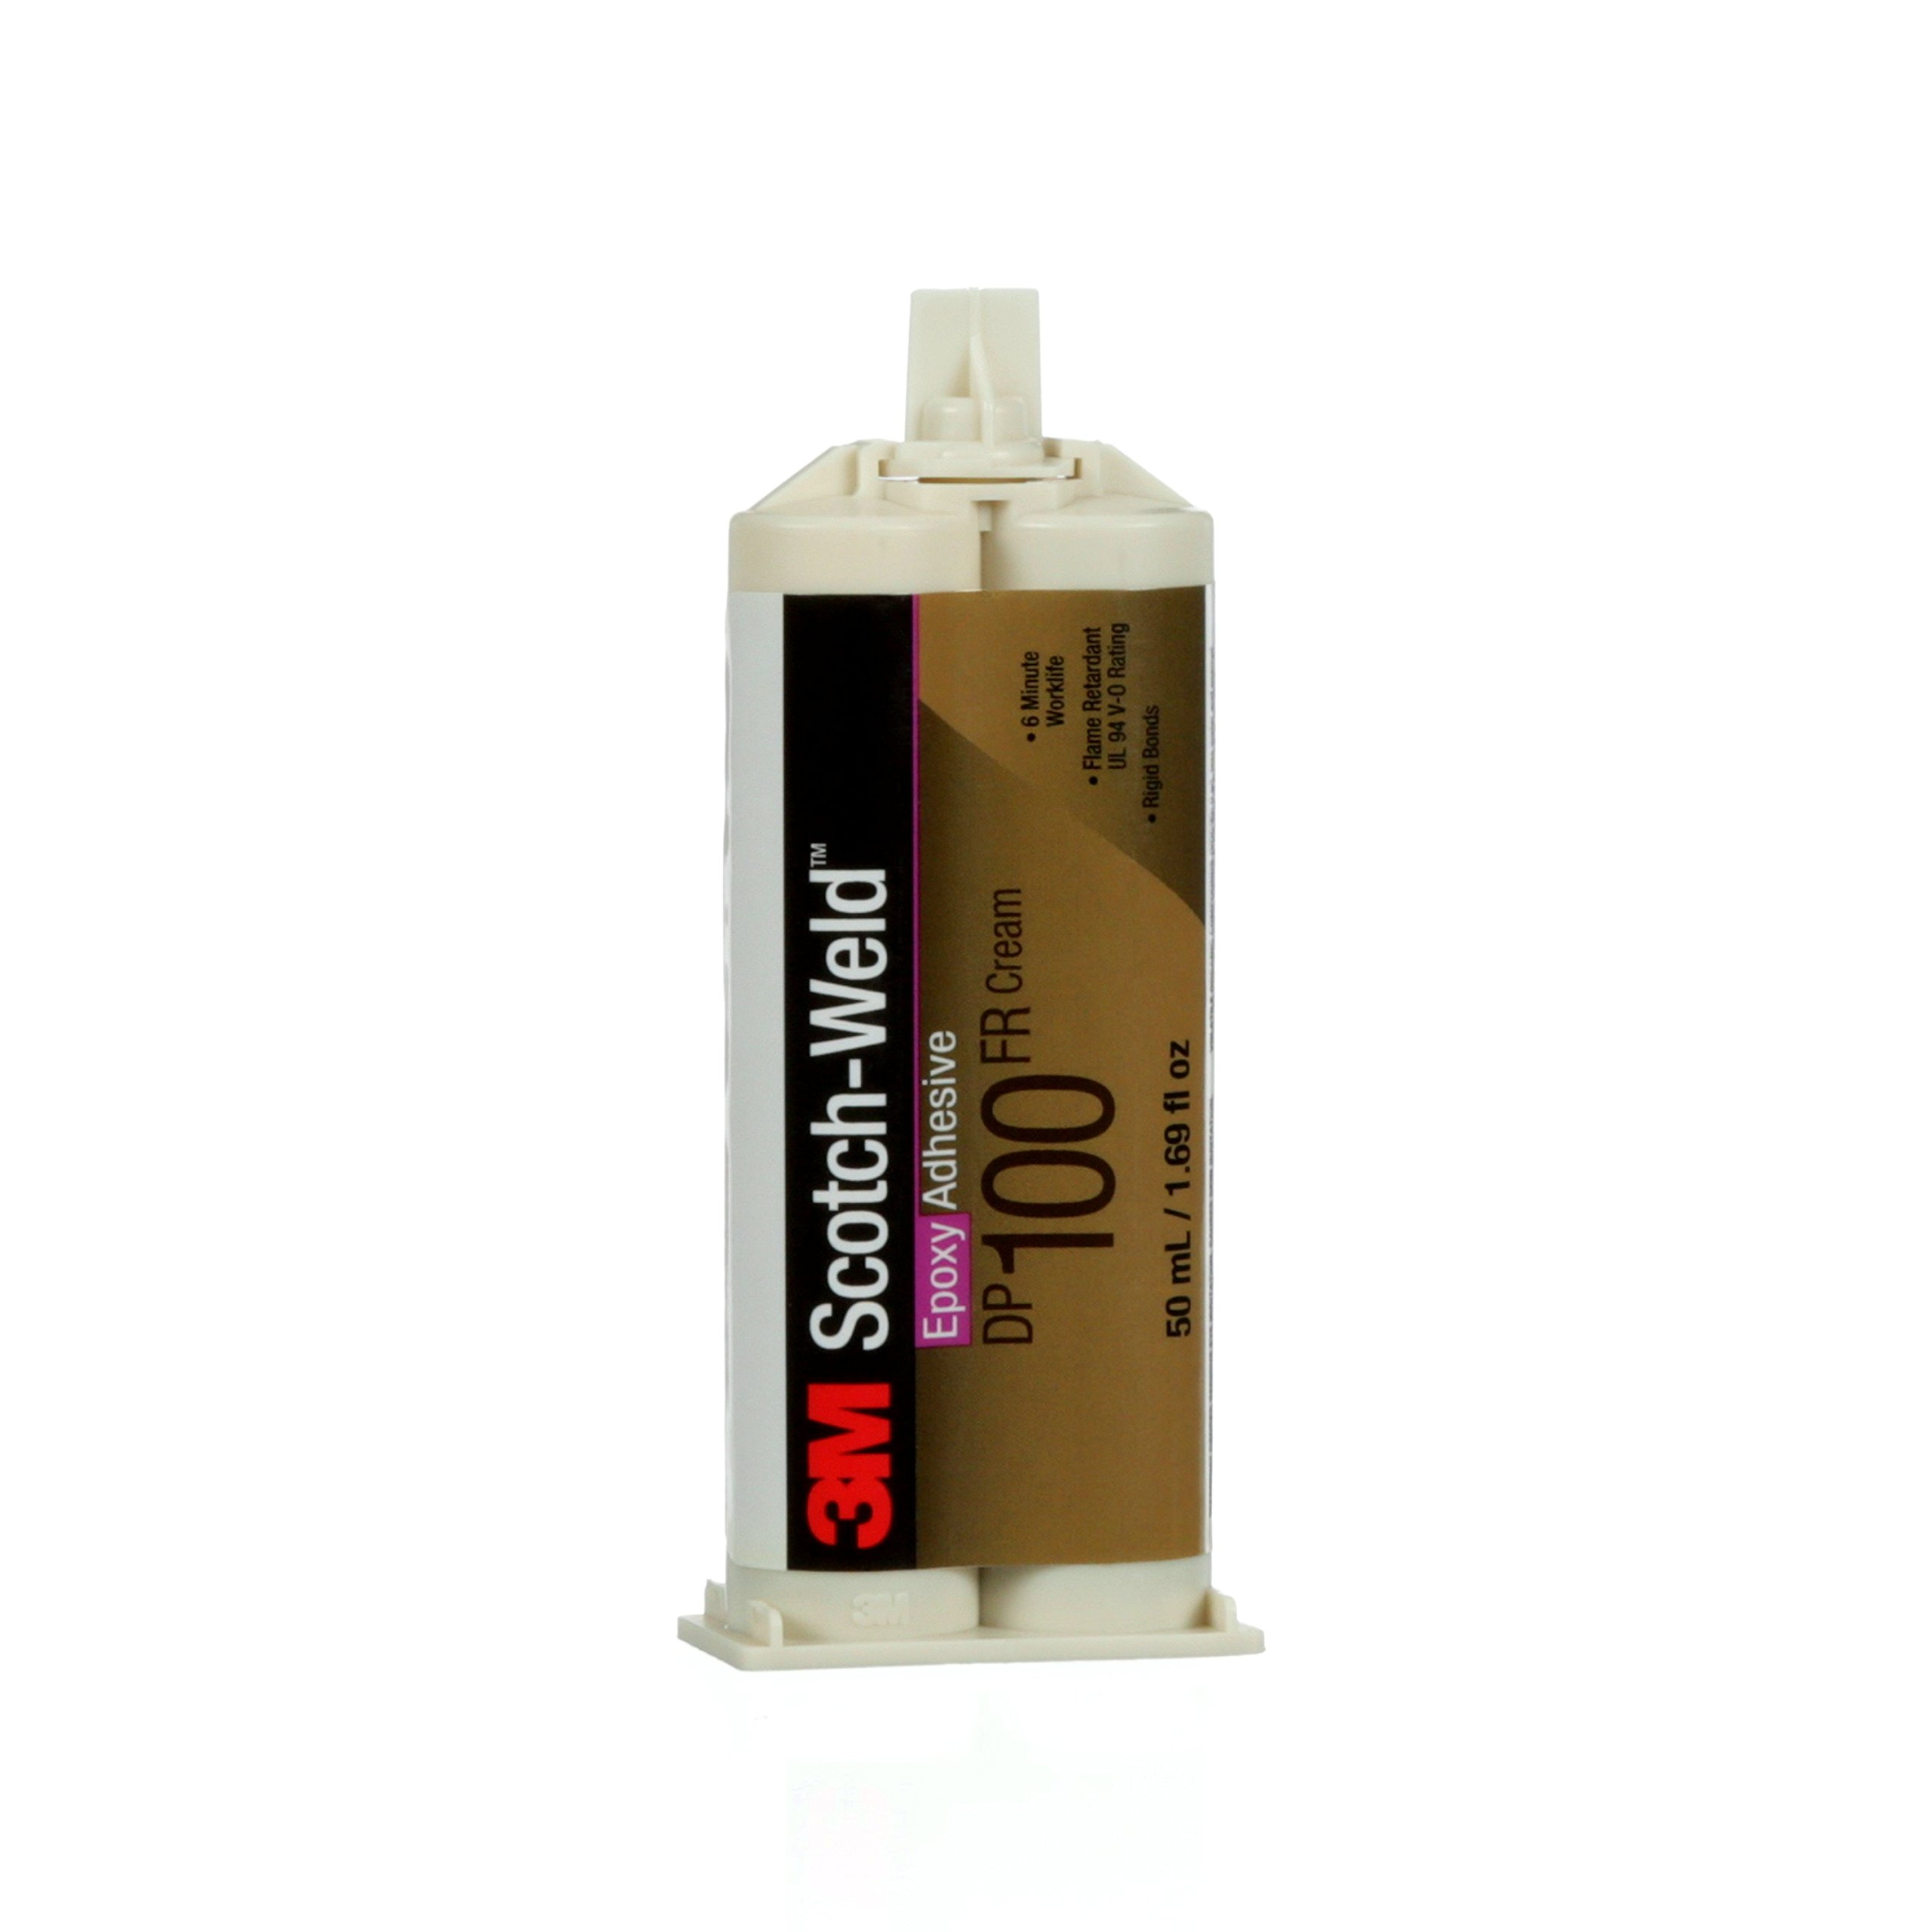 3M Scotch-Weld 56742 Epoxy Adhesive DP100 FR, 50 mL, Cream, 1.69 fl. oz.